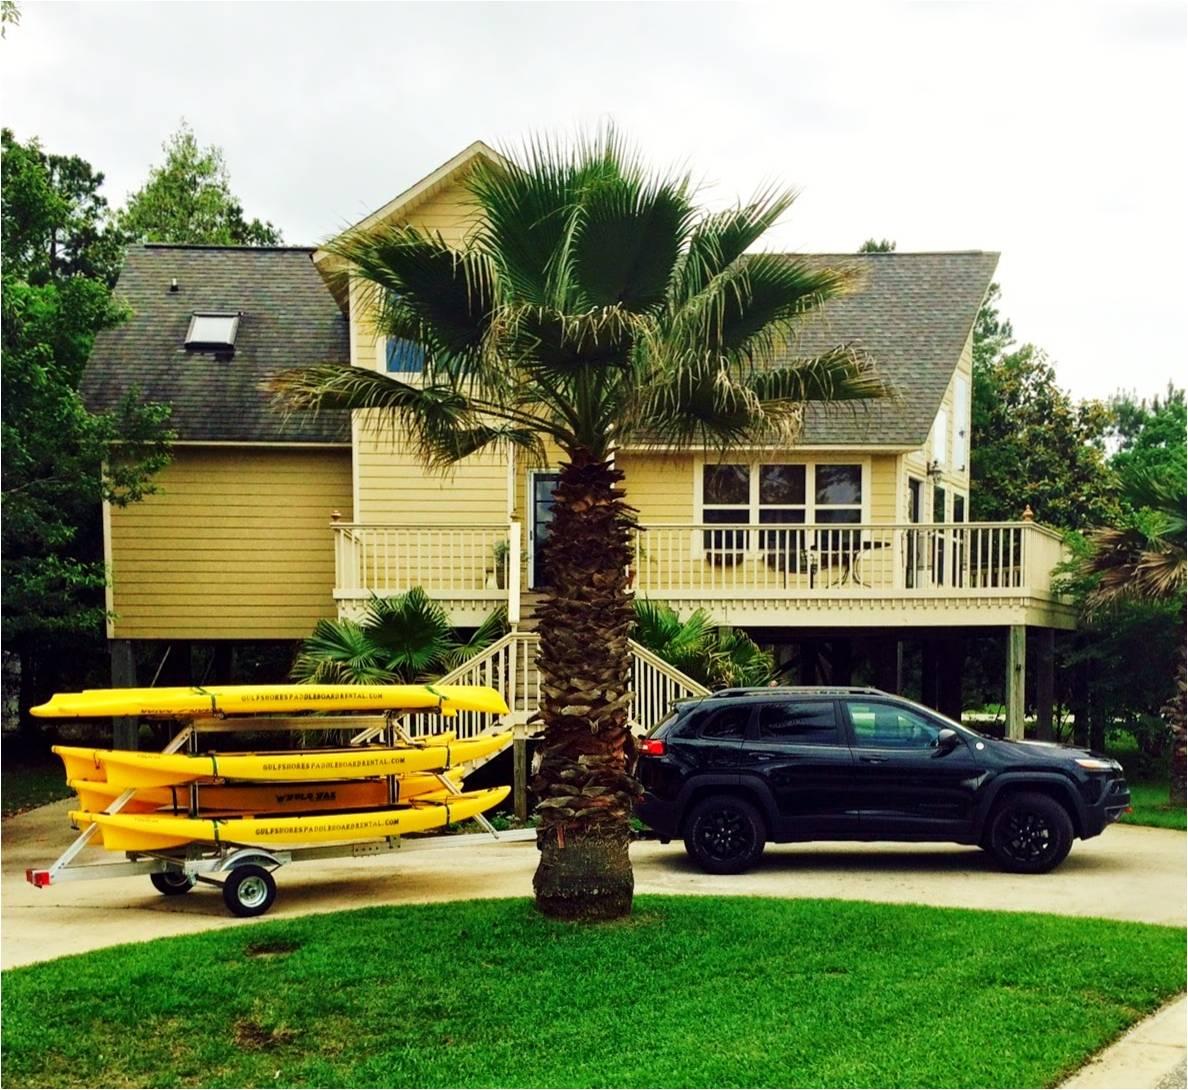 Perdido Key Fl Kayak: Pensacola Paddle Board Rental And Sales: Tandem Kayak